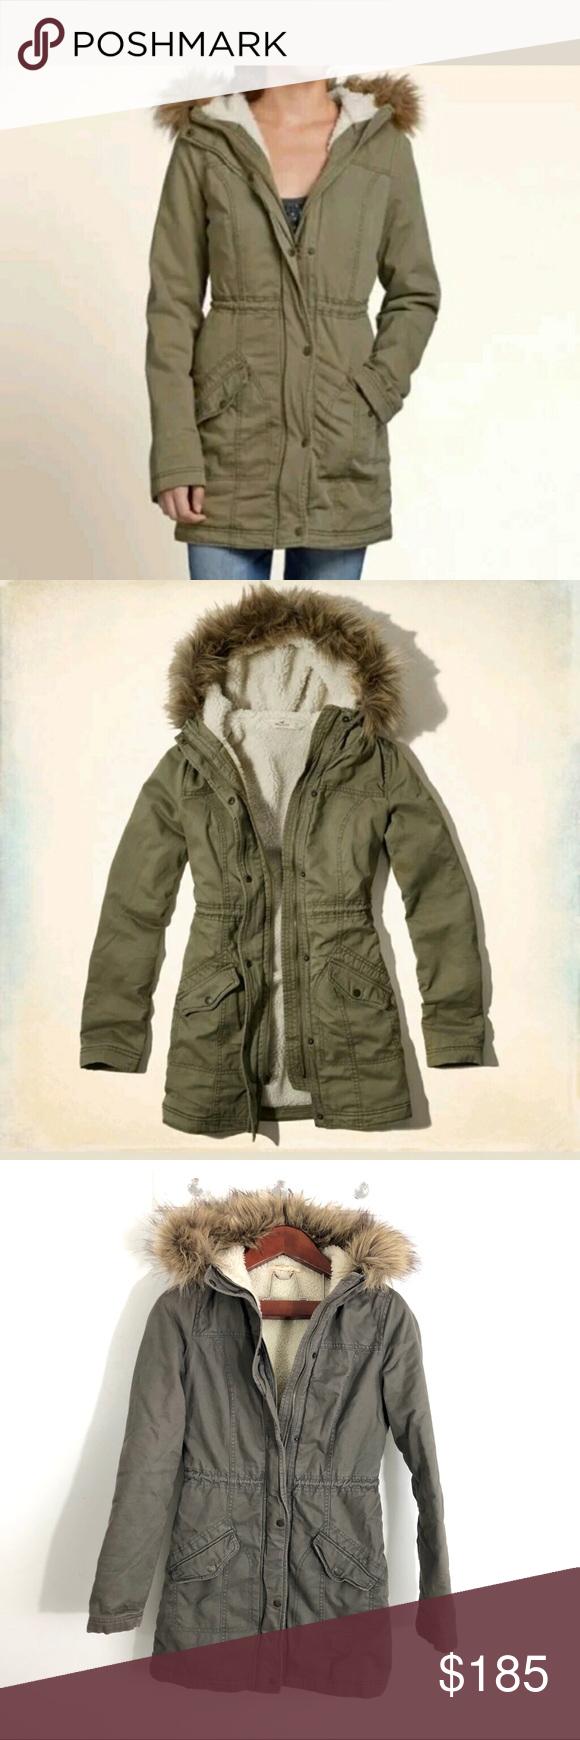 Hollister Olive Green Hunter Trench Fur Coat S Fur Coat Hollister Hollister Jackets [ 1740 x 580 Pixel ]